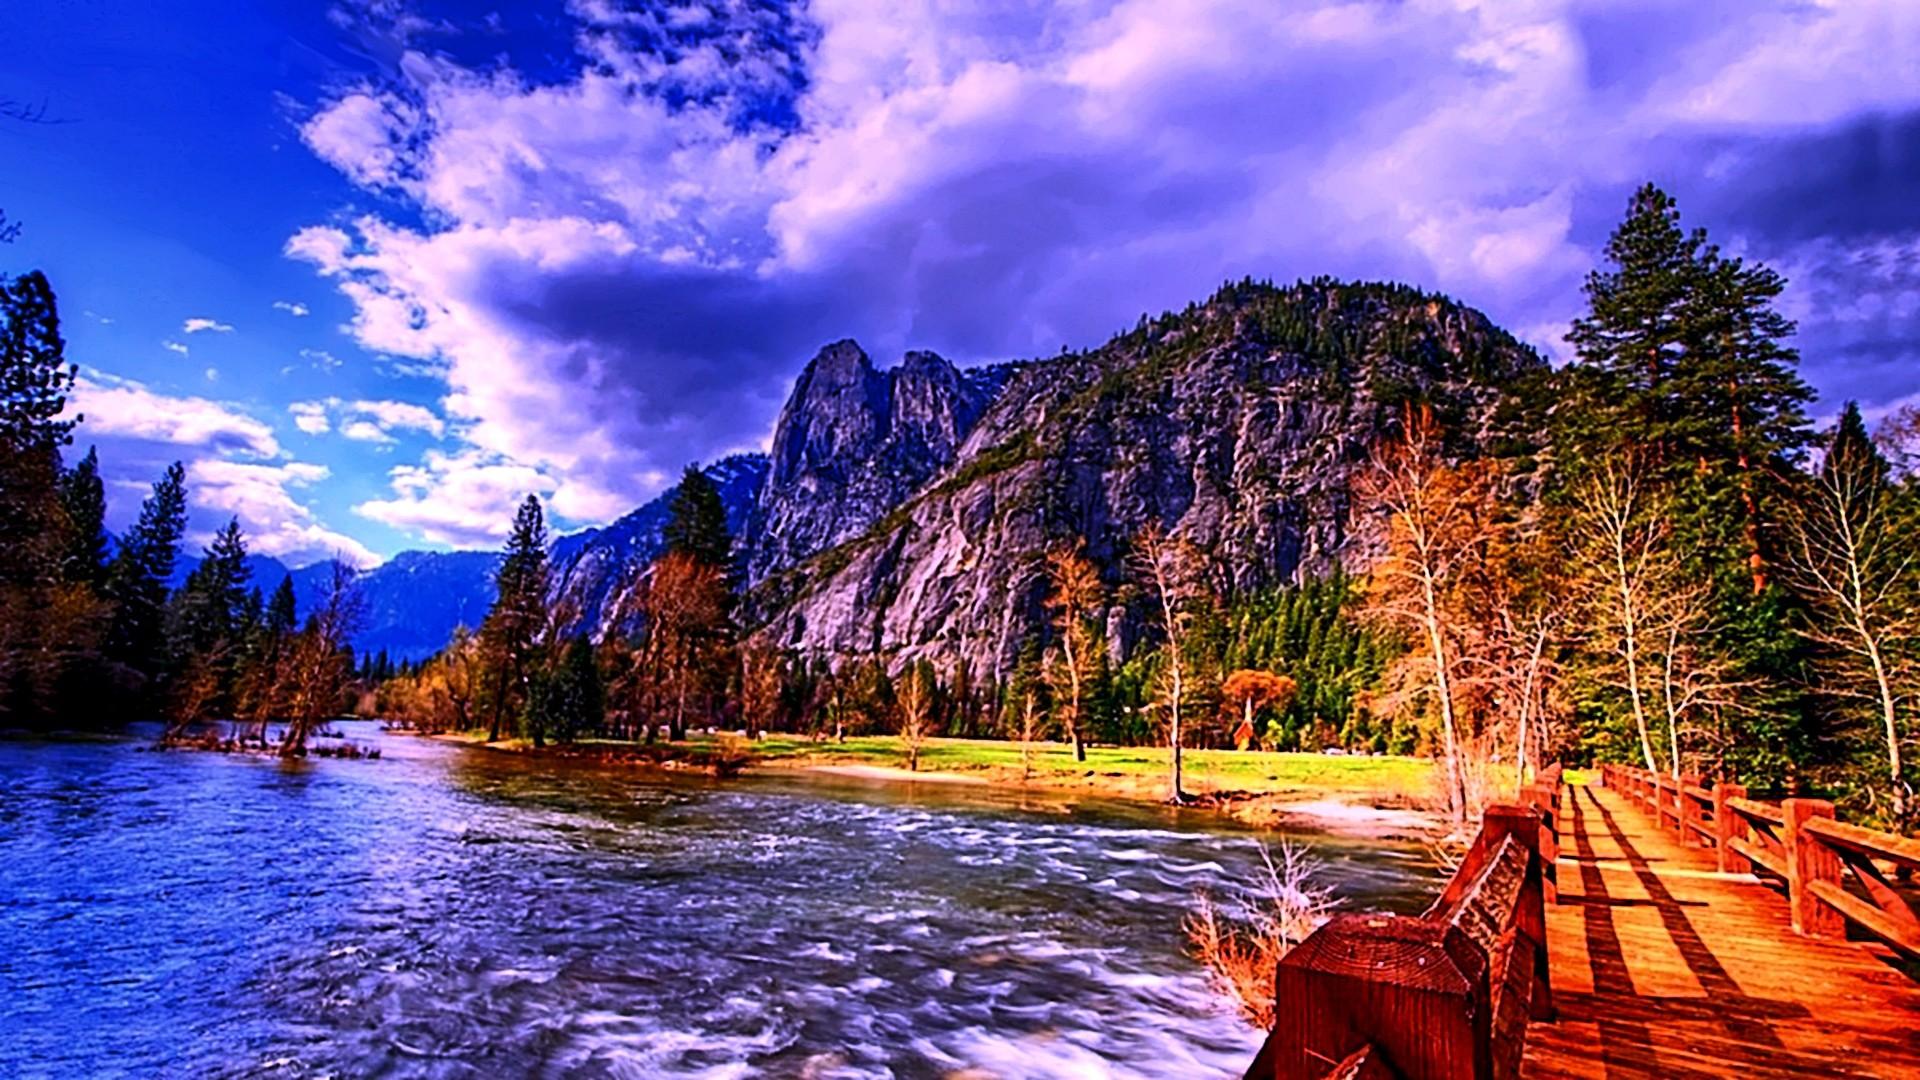 nature wallpaper hd,natural landscape,nature,sky,reflection,wilderness